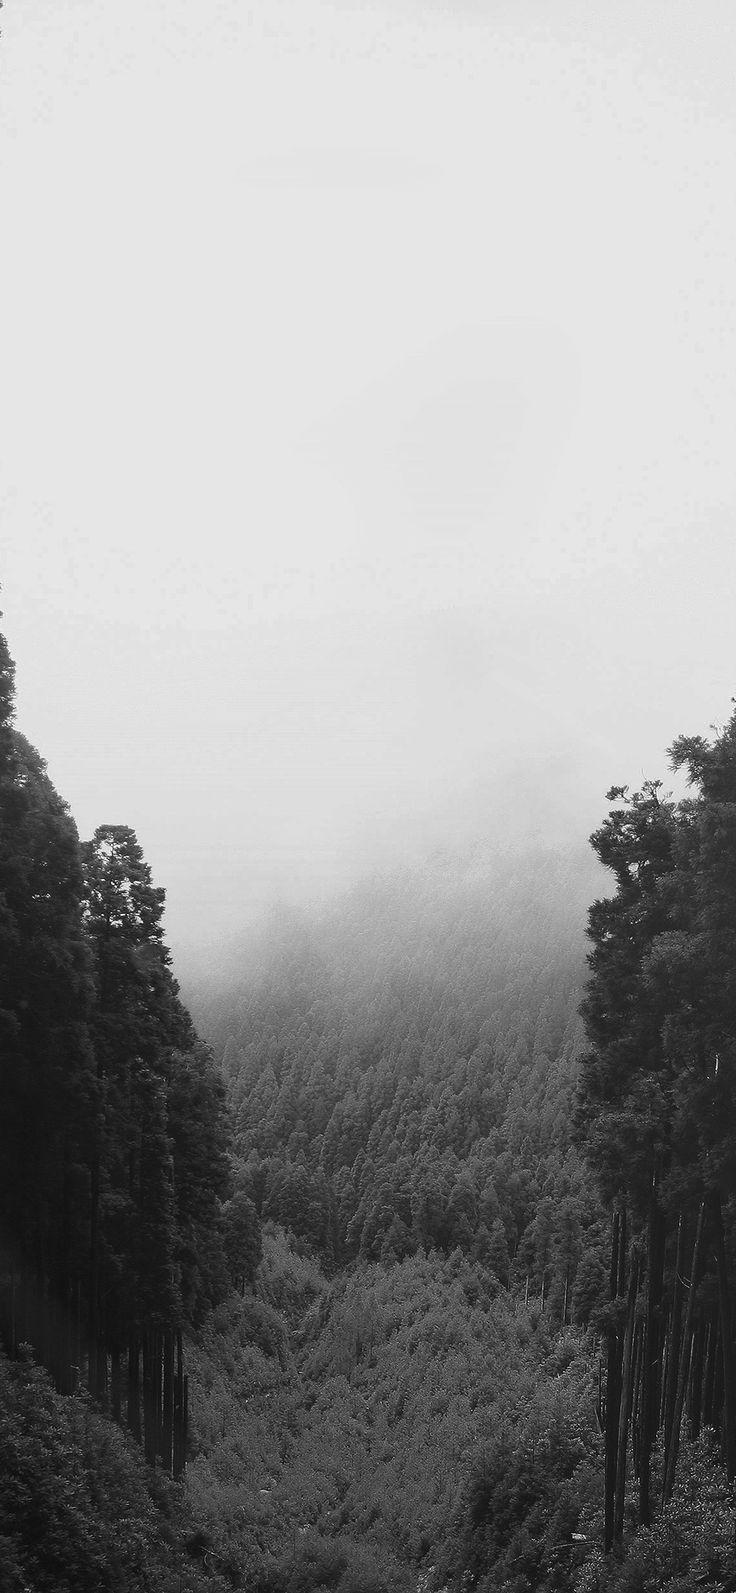 Iphone X Wallpaper Mq89 Mountain Mirror Green Wood Nature Dark Via